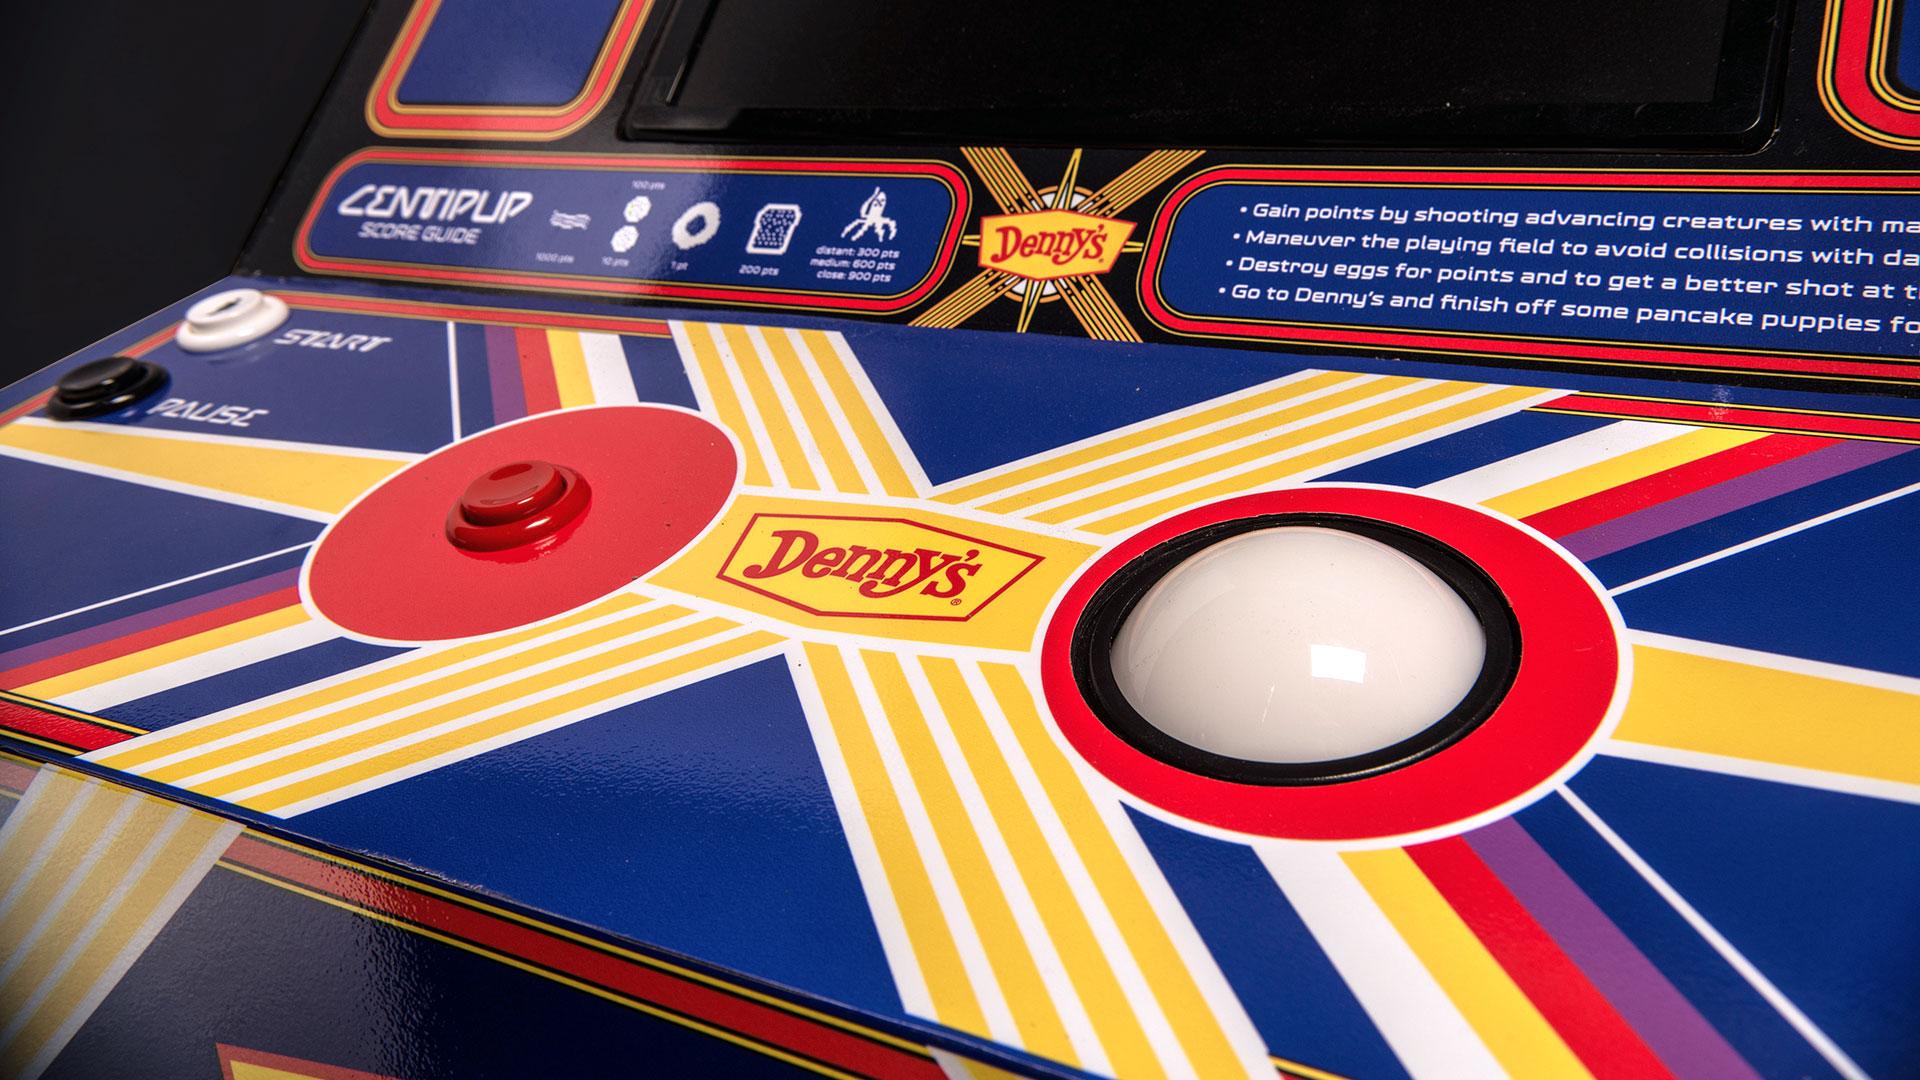 Denny's Atari Battle Royale Centipup Arcade Controls